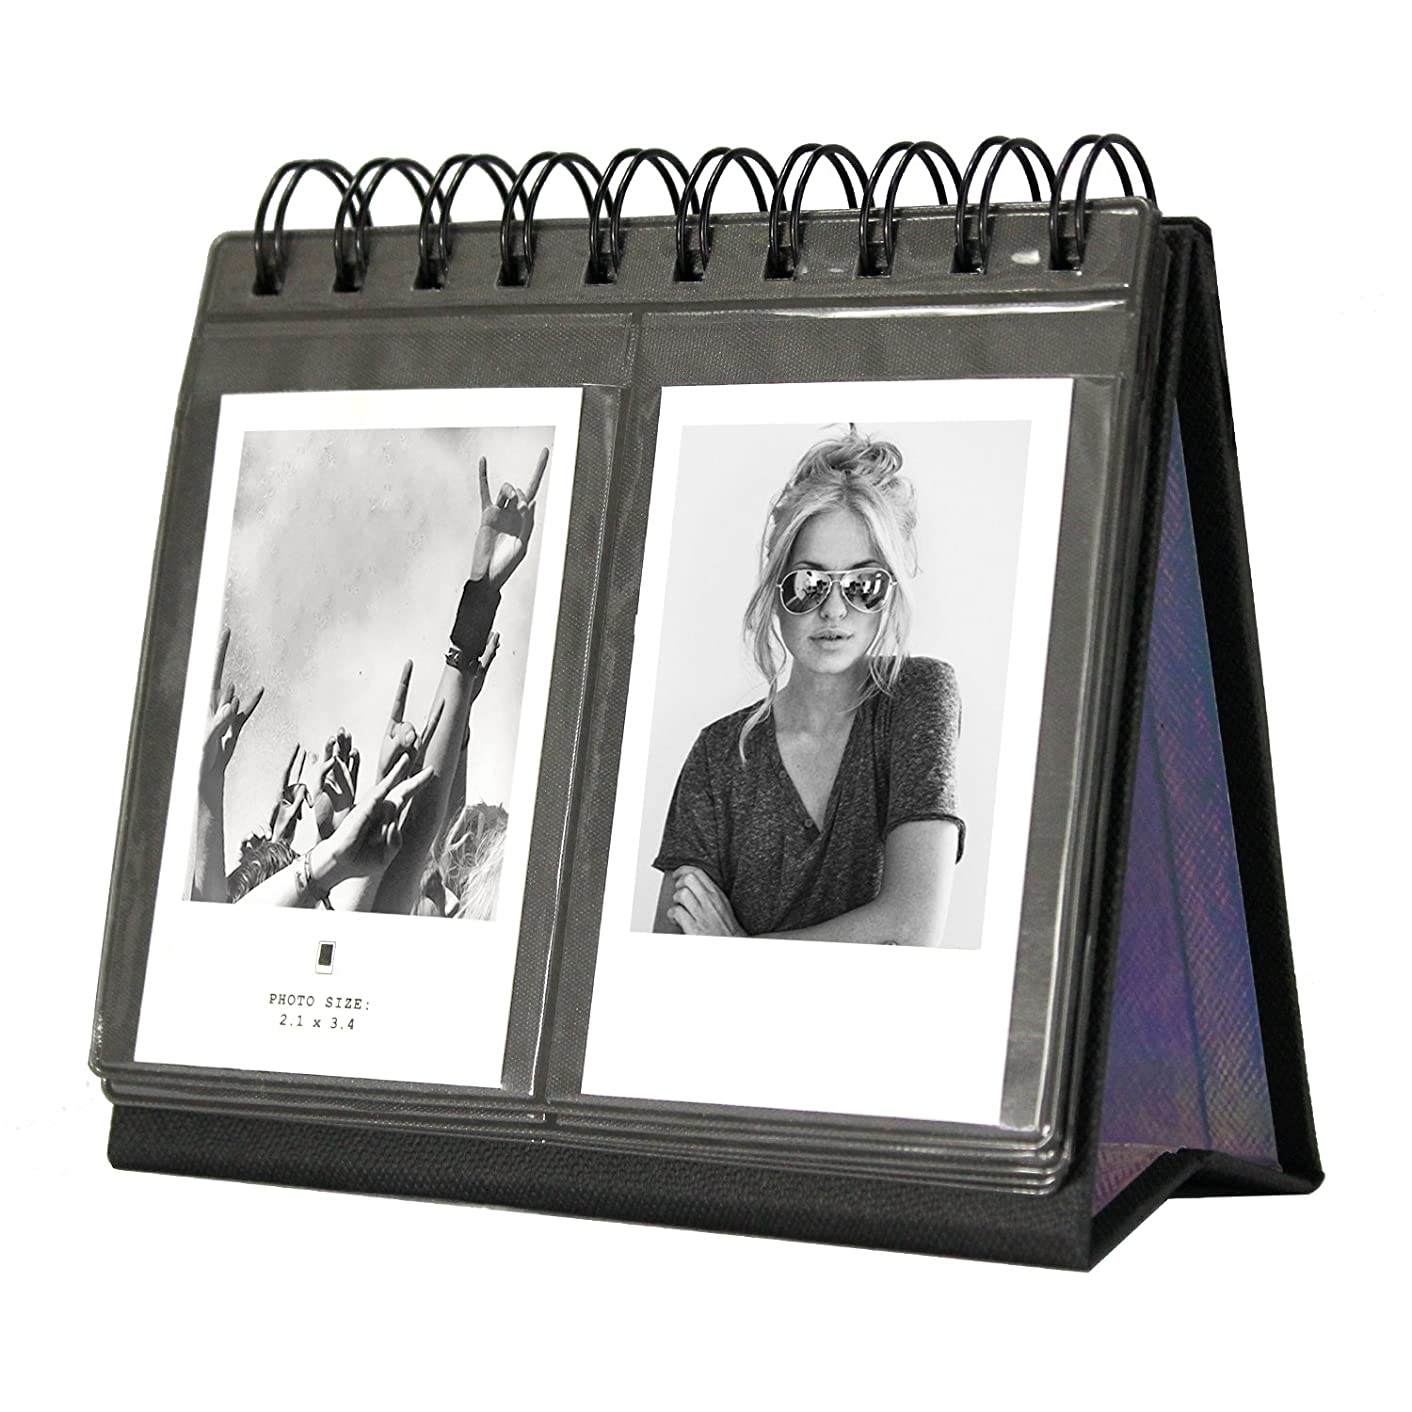 [Fujifilm Instax Mini Photo Album] 68 Pockets Desk Calendar Album for Fuji Instant Mini 70 7s 8 25 50s 90, Polaroid Z2300, Polaroid PIC-300P Film (Black)